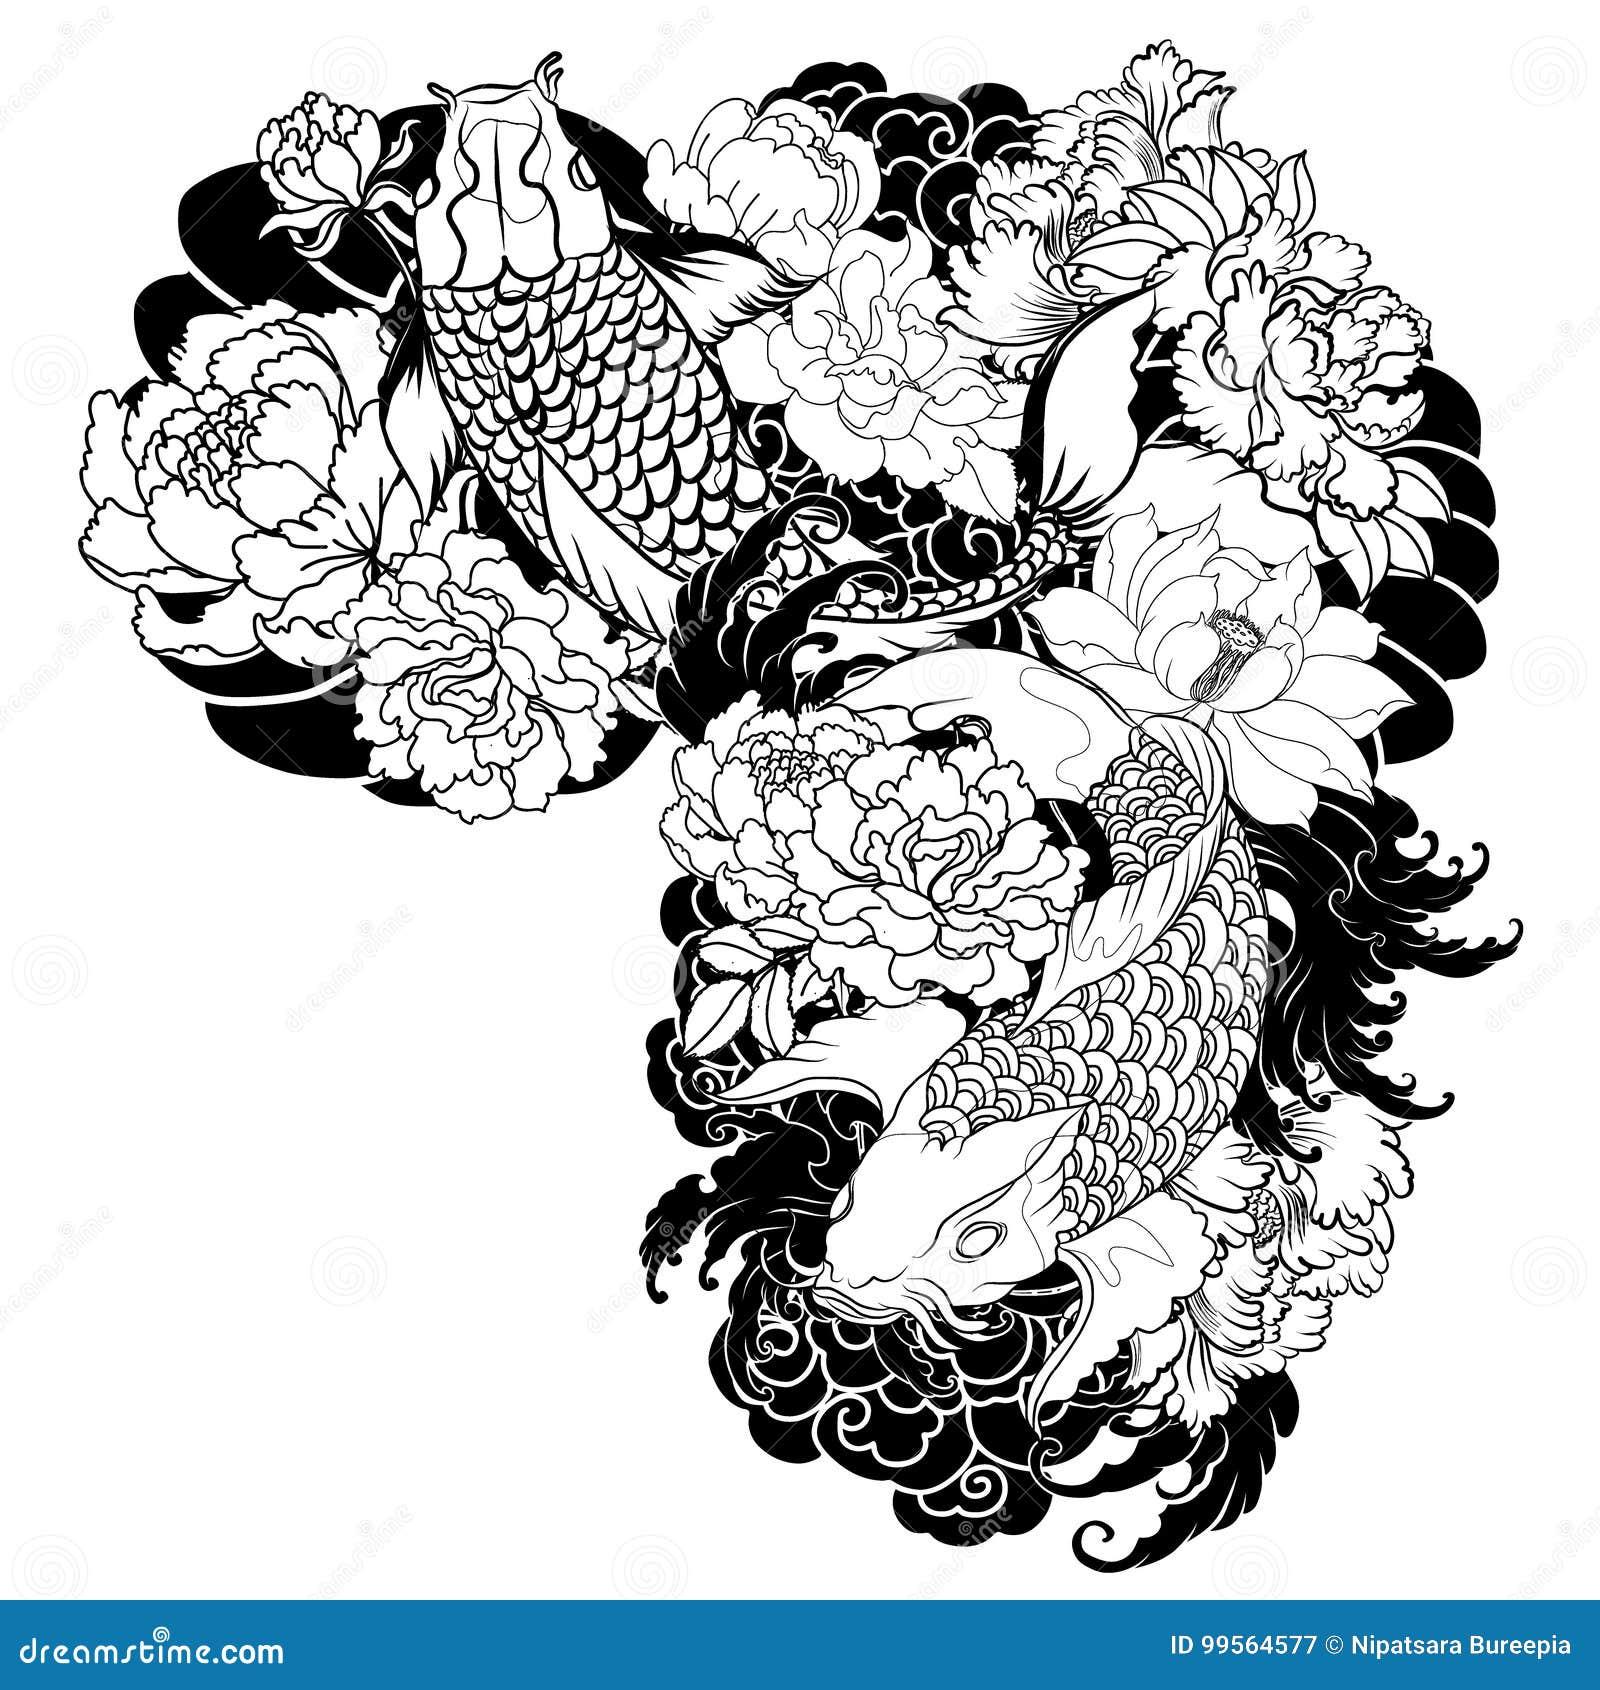 Beautiful colorful koi carp with water splash lotus and peony beautiful colorful koi carp with water splash lotus and peony flower traditional japanese tattoo design background drawn izmirmasajfo Images